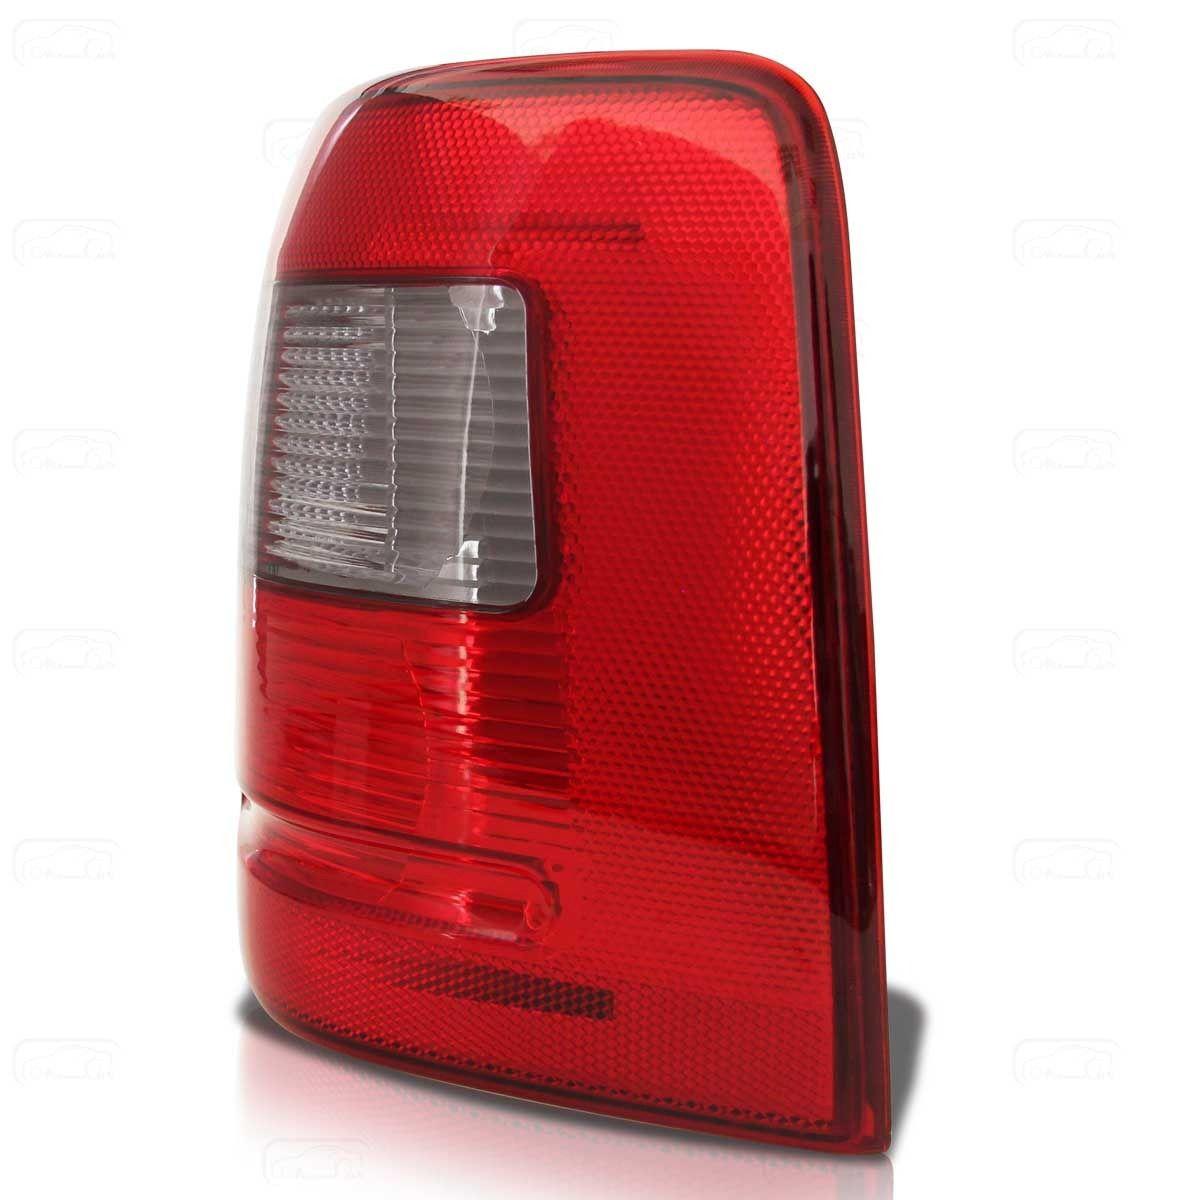 Lanterna Traseira Fumê Ford Ecosport 2004 05 06 07 Tyc